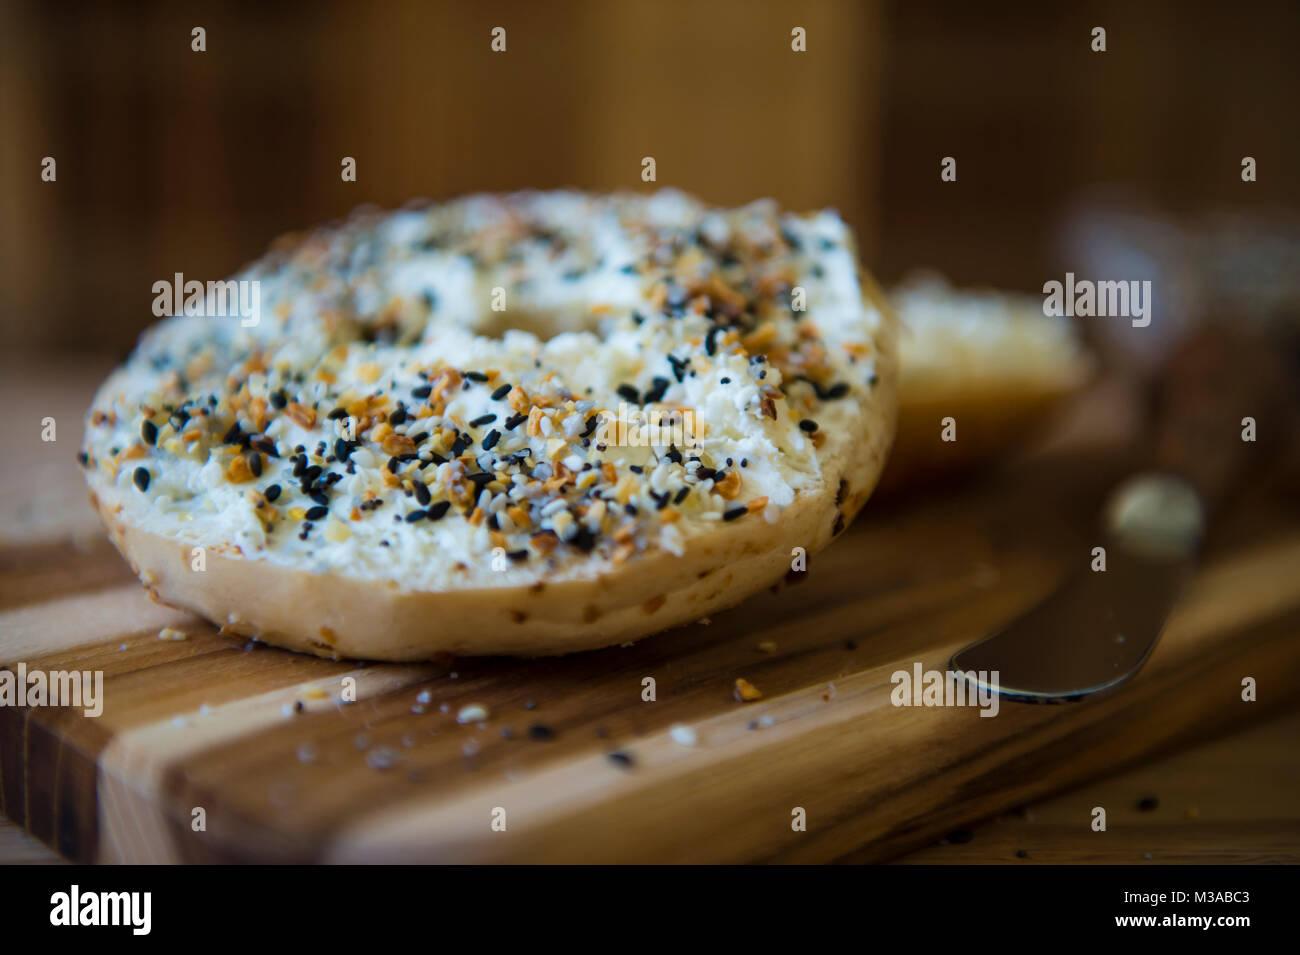 Food Photography/Bagel/Art - Stock Image